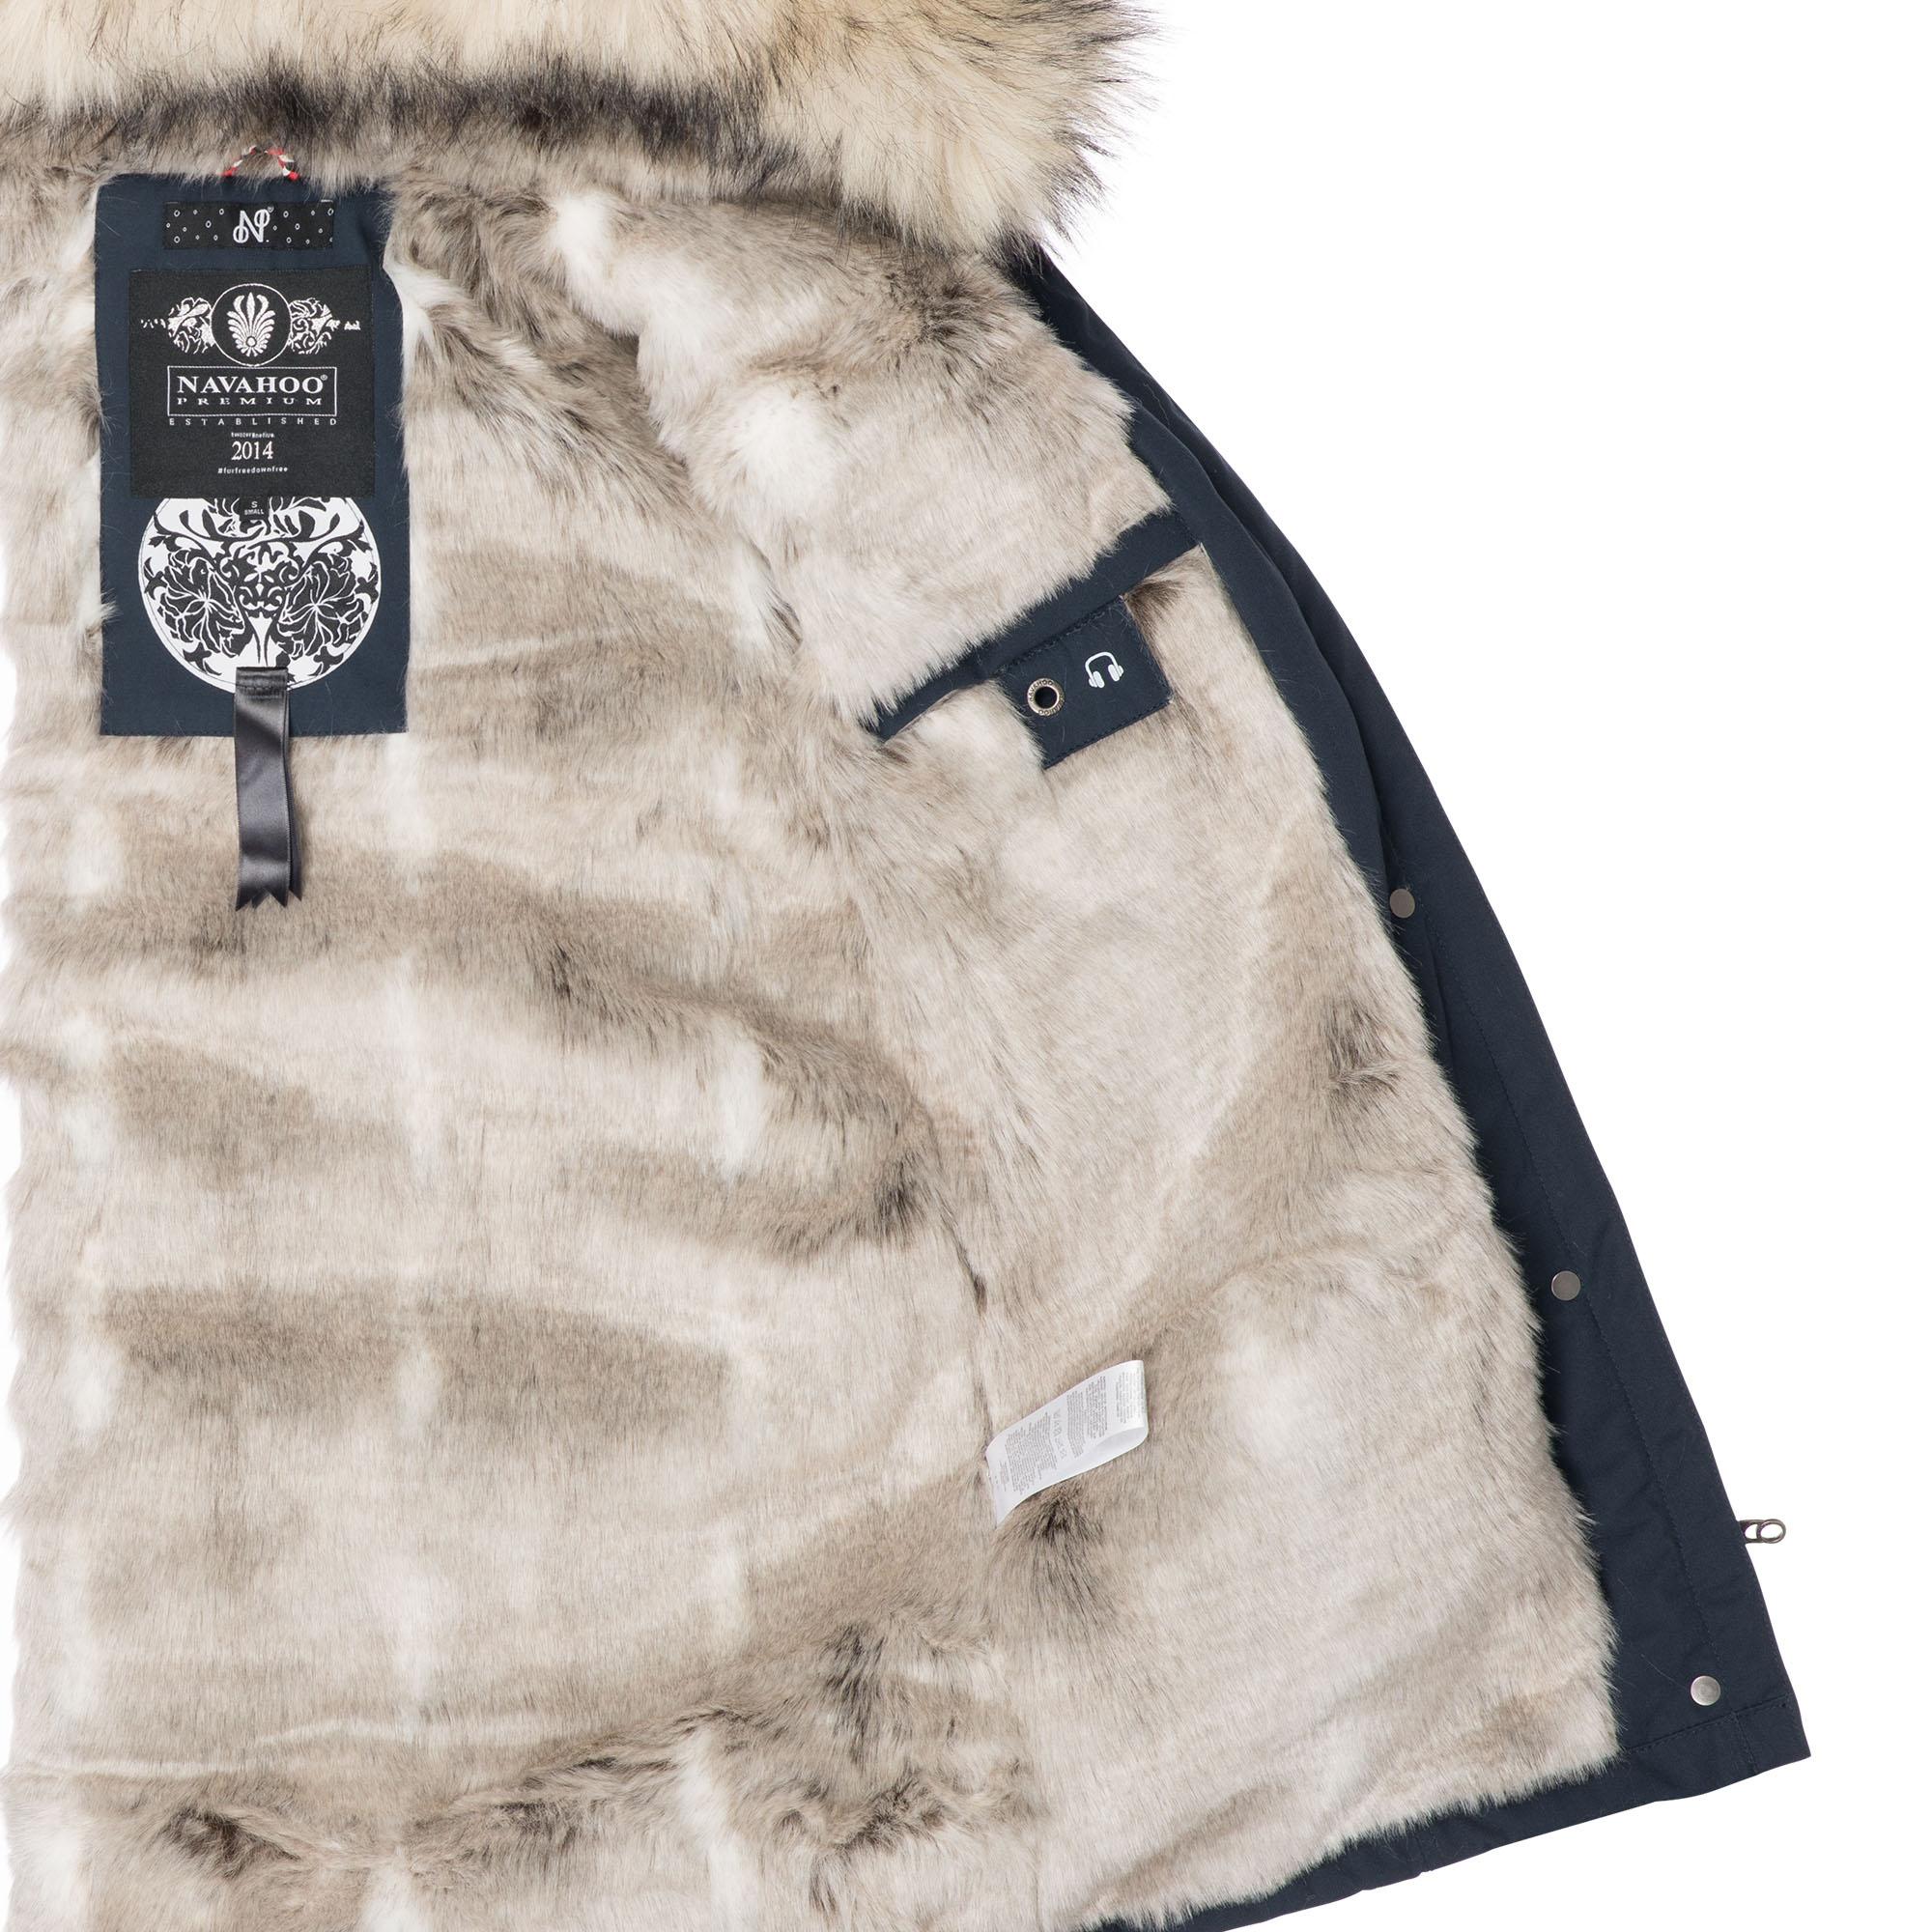 Navahoo-Premium-Damen-Winter-Jacke-Parka-Mantel-Winterjacke-warm-Kunstfell-B669 Indexbild 11